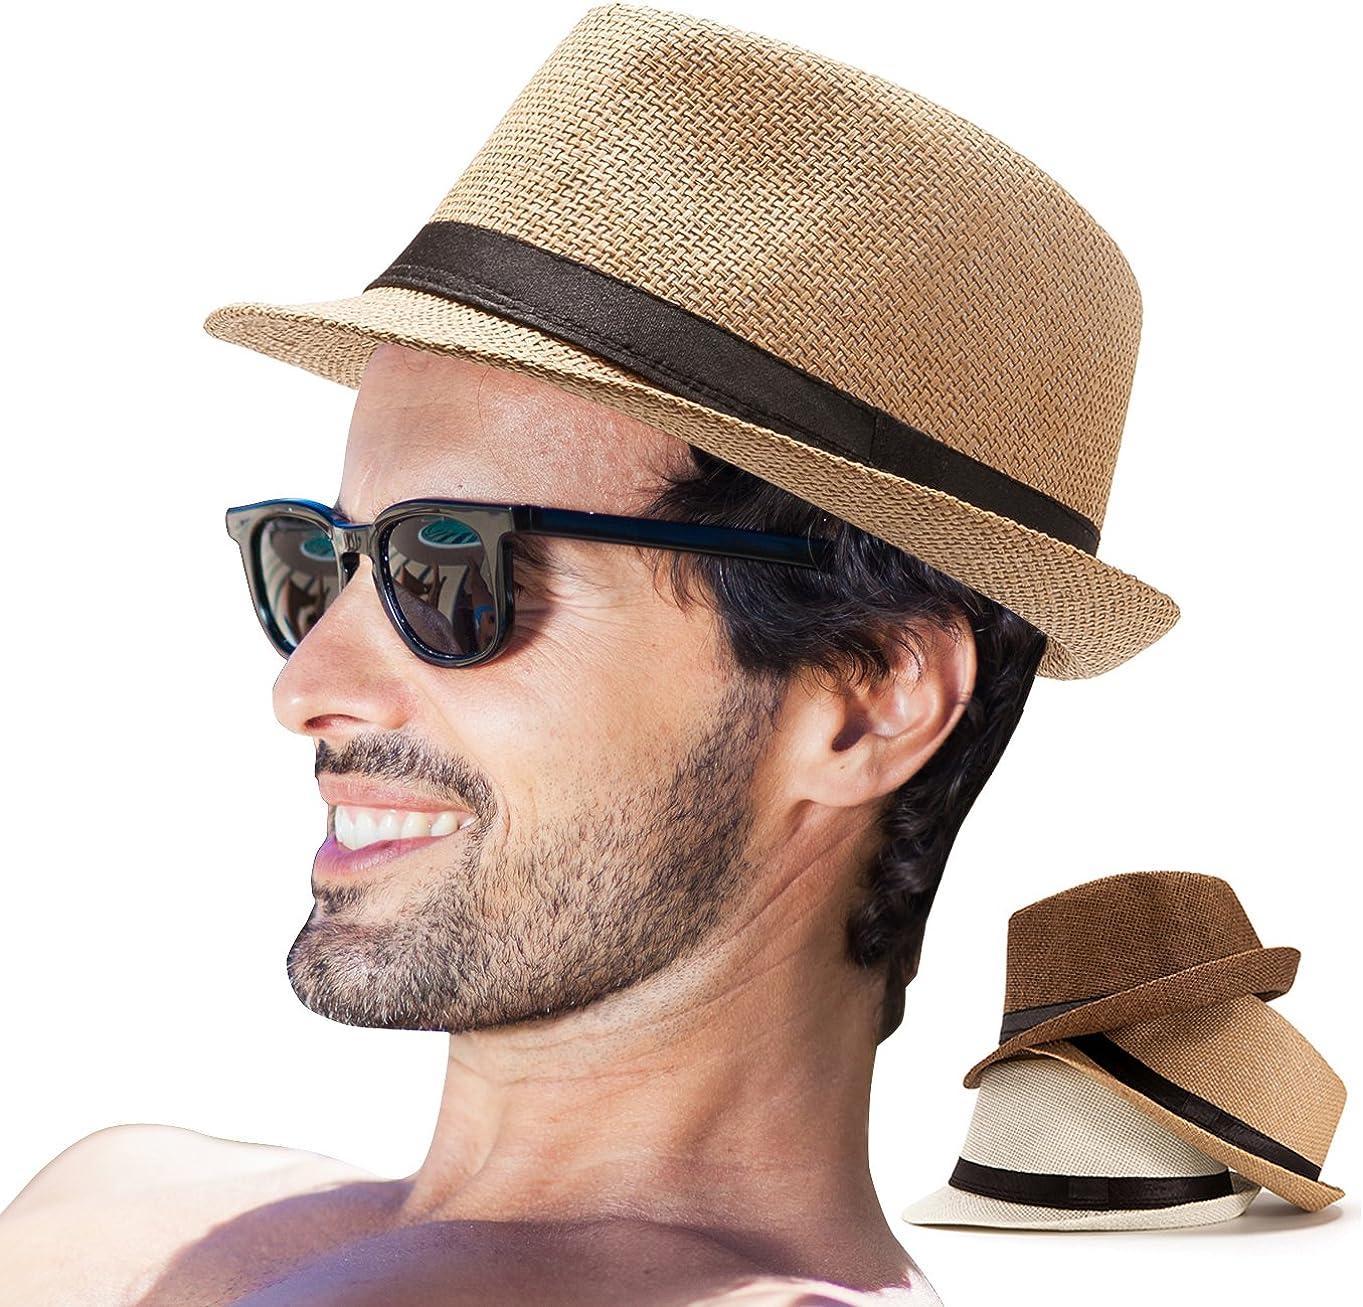 LADYBRO Sale SALE% OFF Mens Fedora Genuine Hats for Men Panama - Straw H Hat